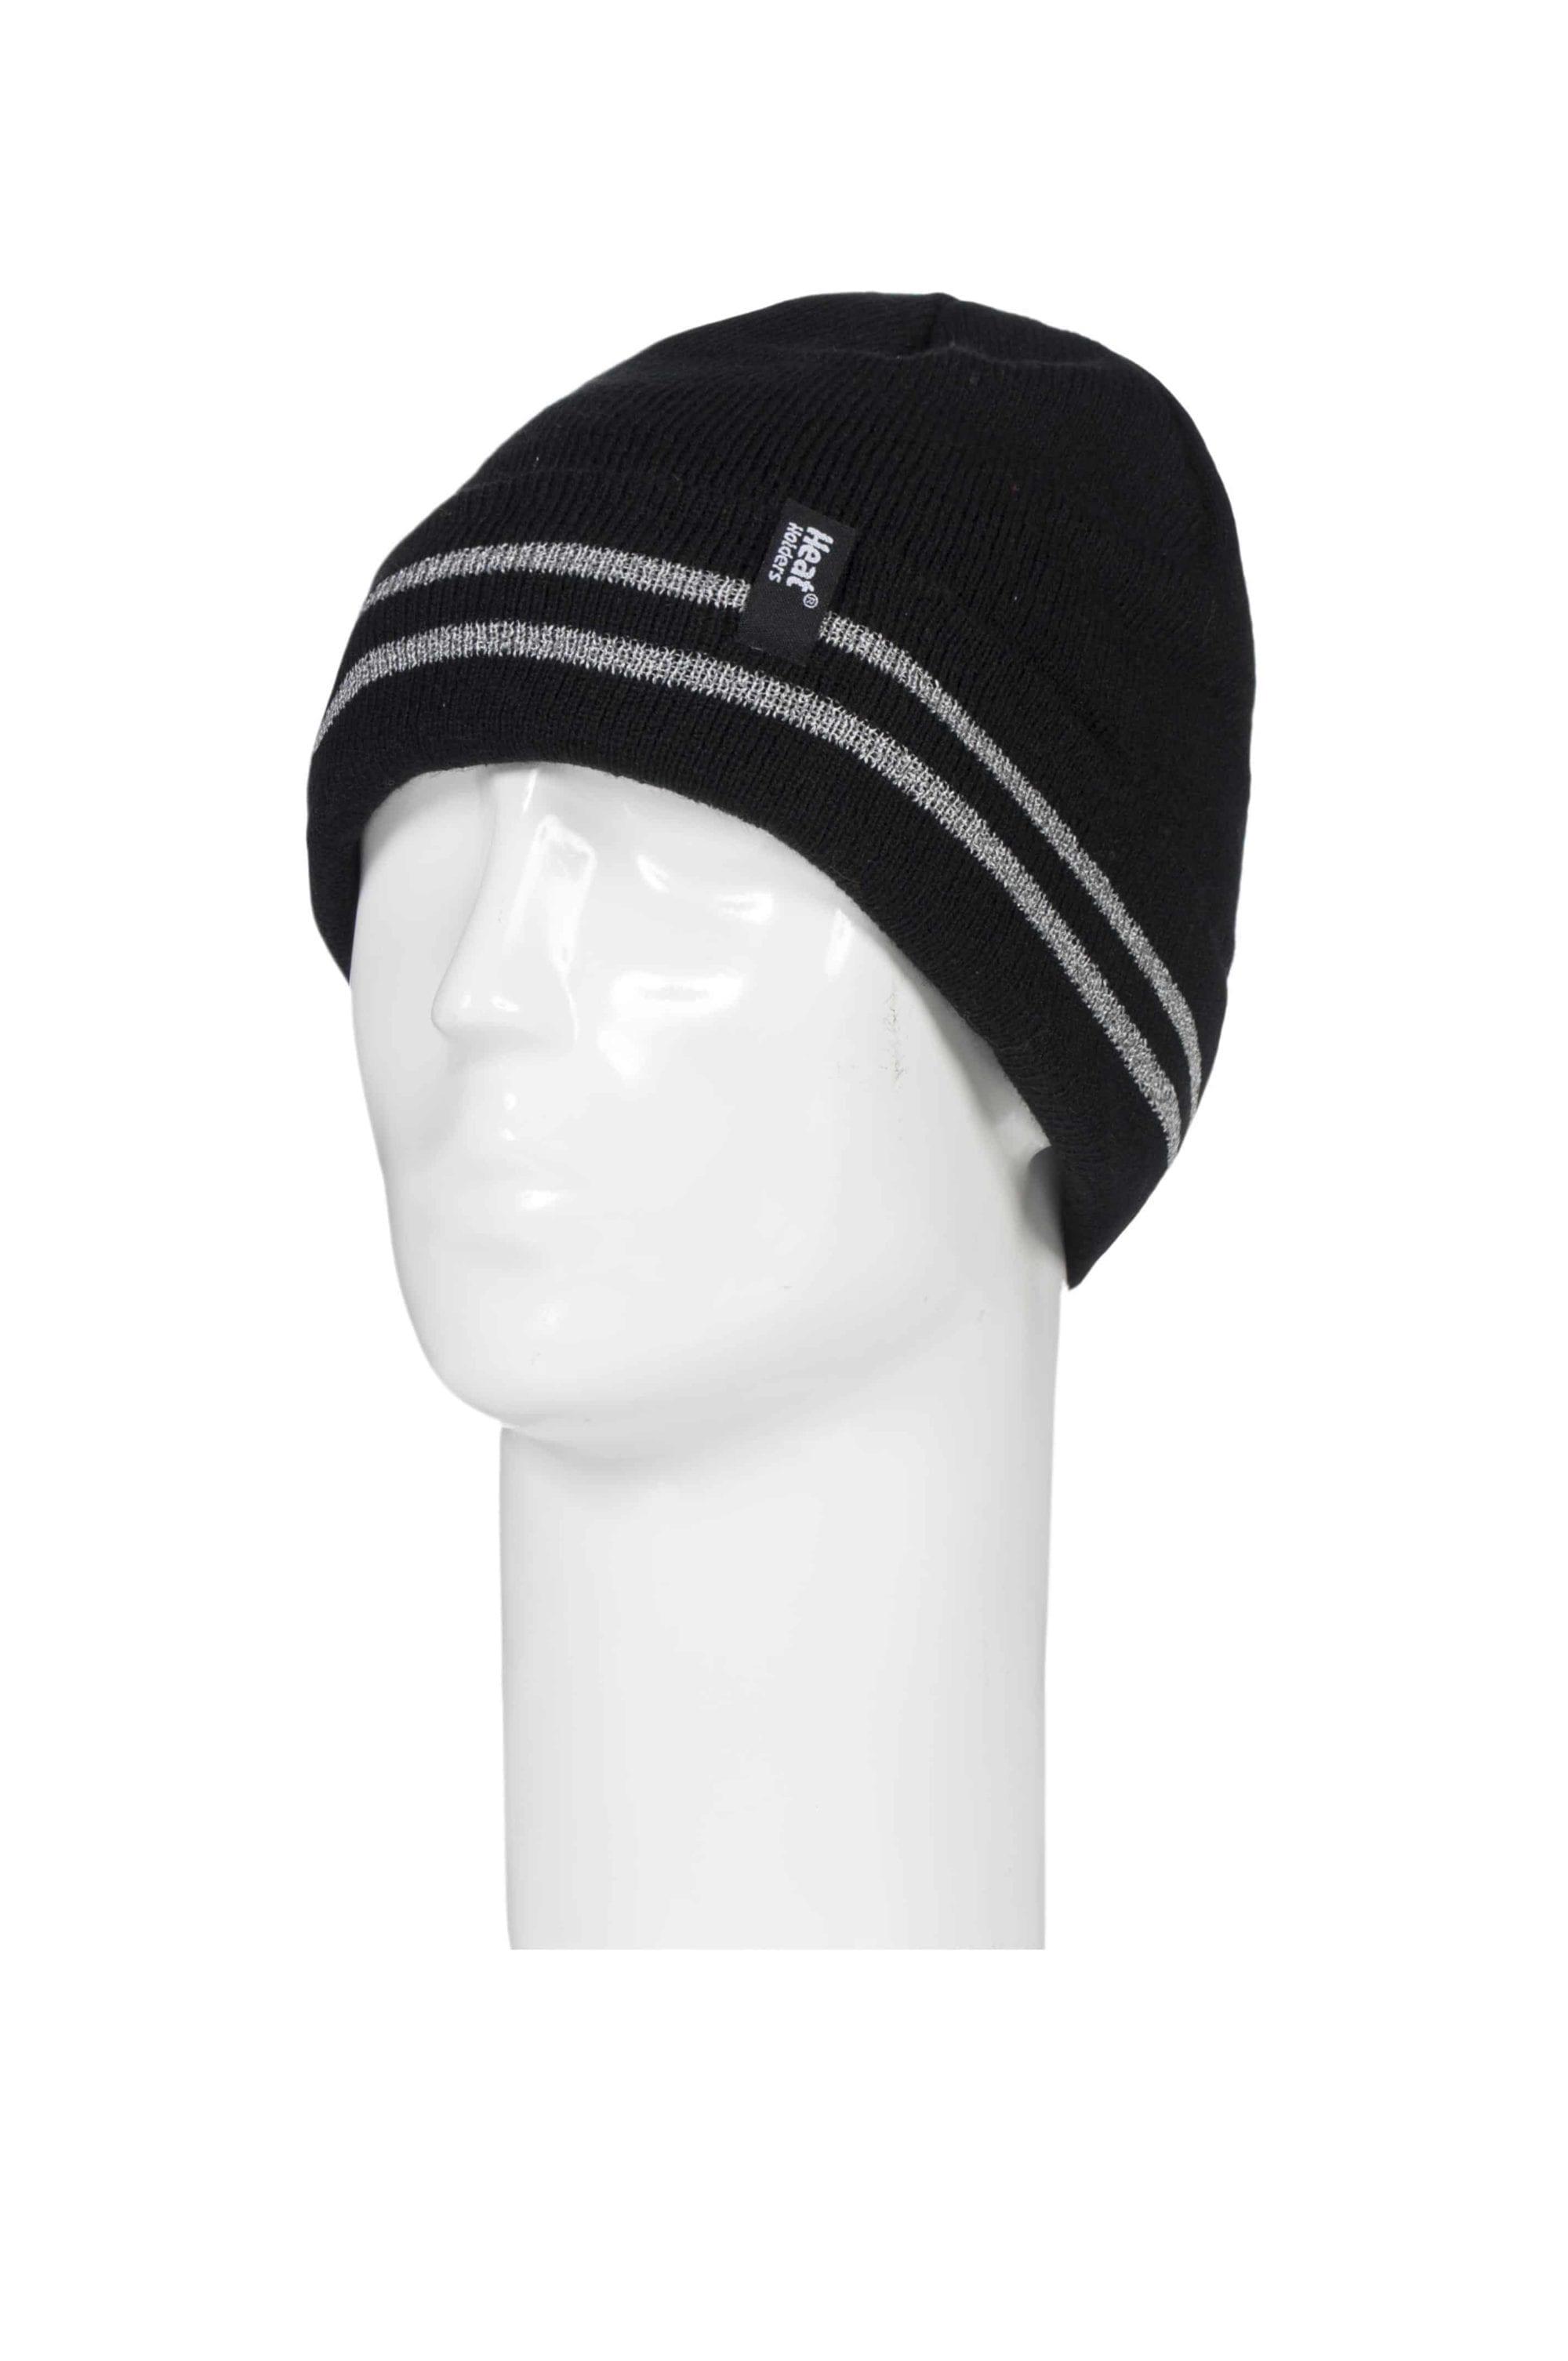 Men's Heat Holders Black Hi-Vis Reflective Thermal Knitted Turnover Hat